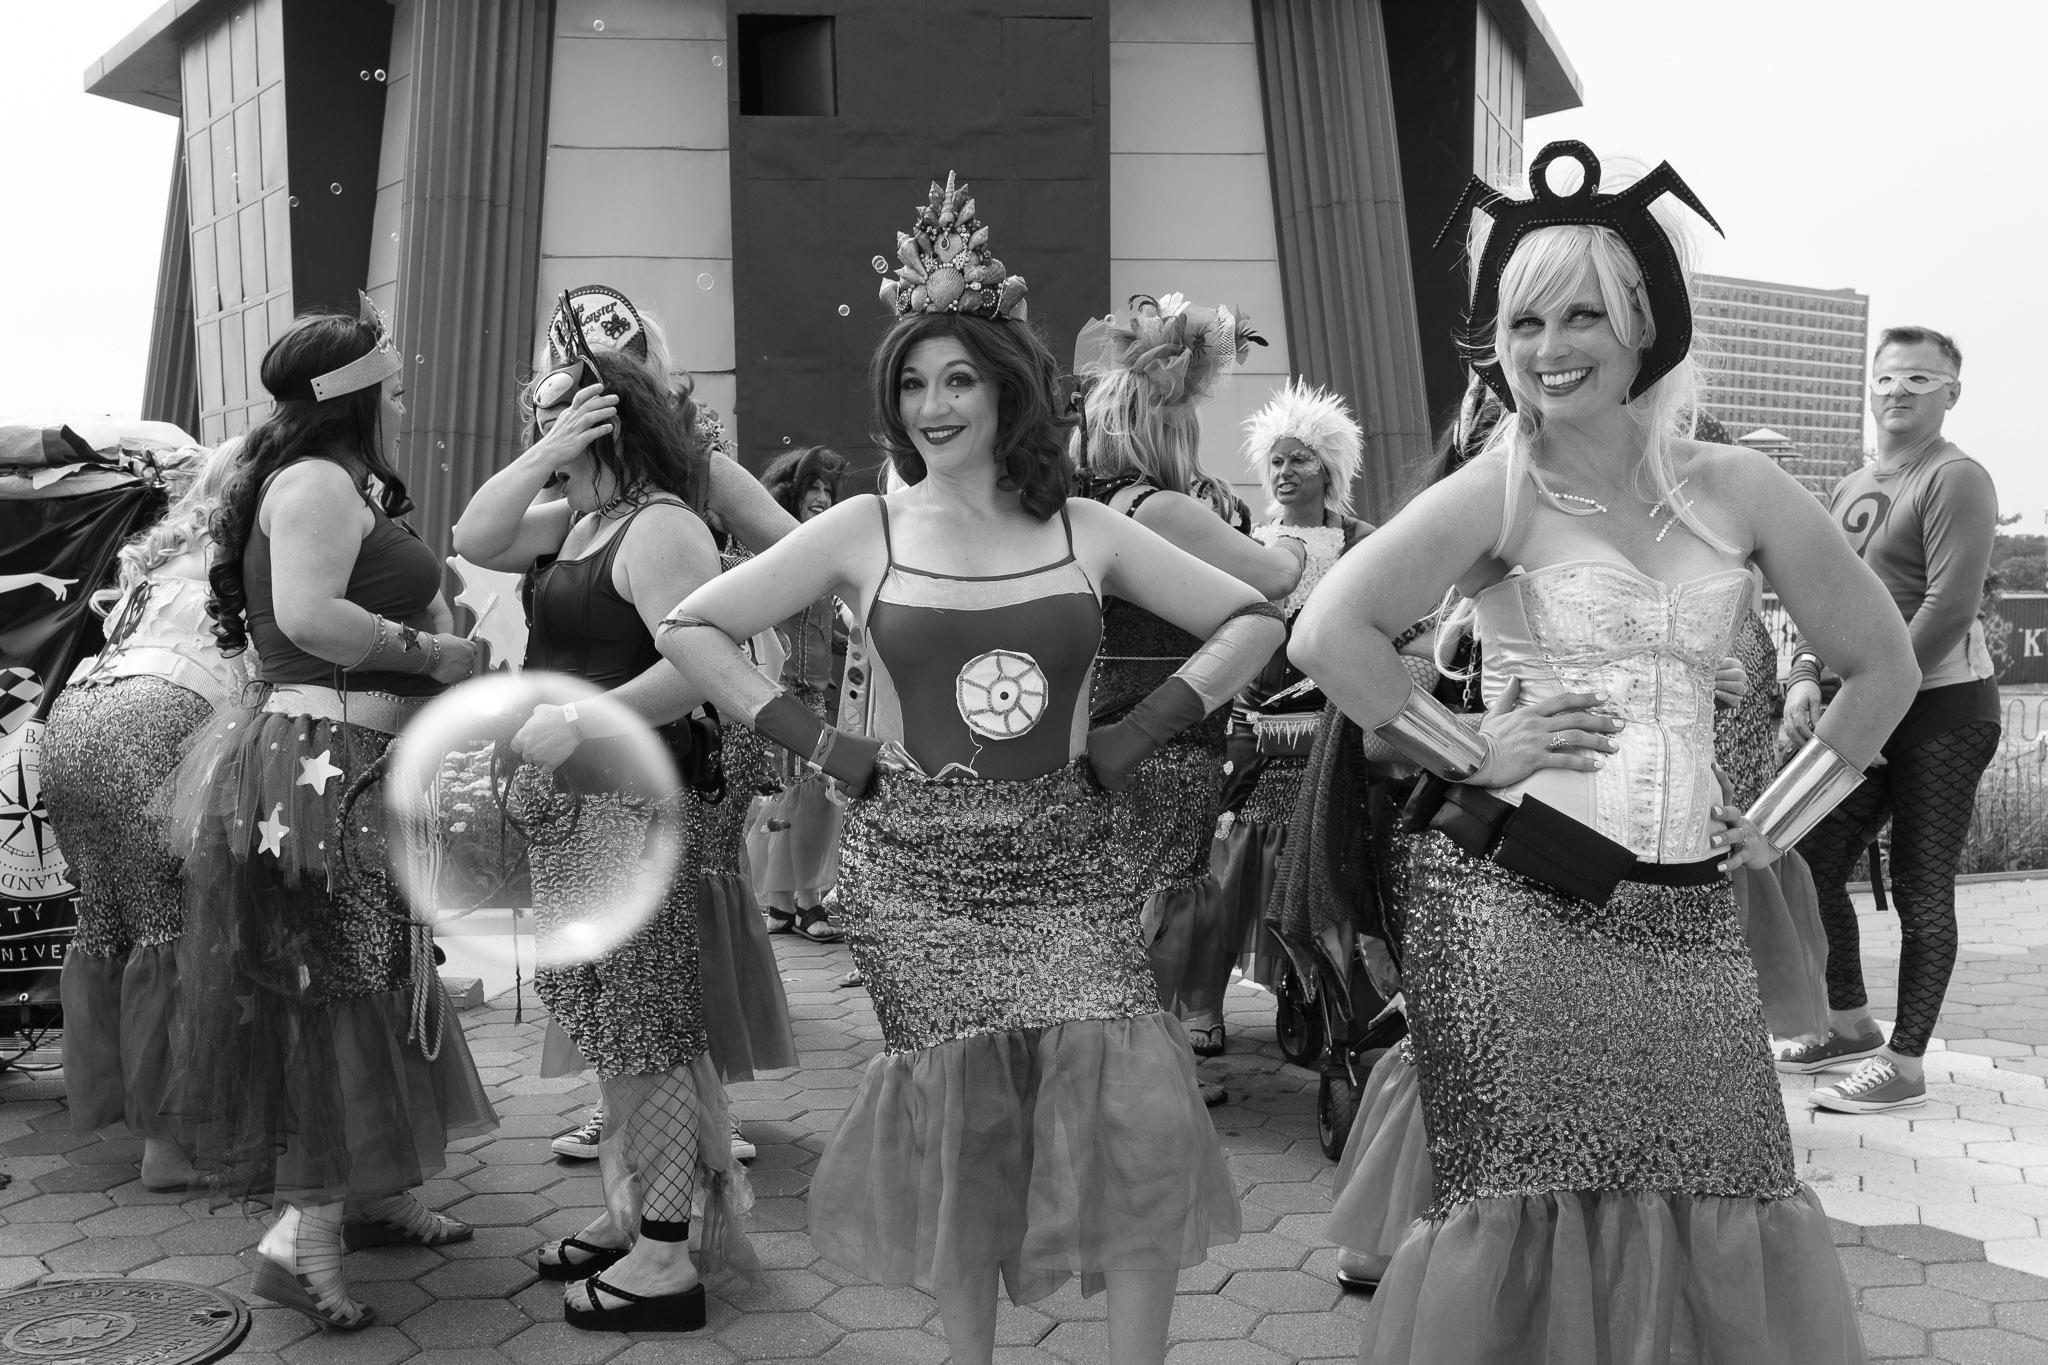 mermaidparade2017_009.jpg